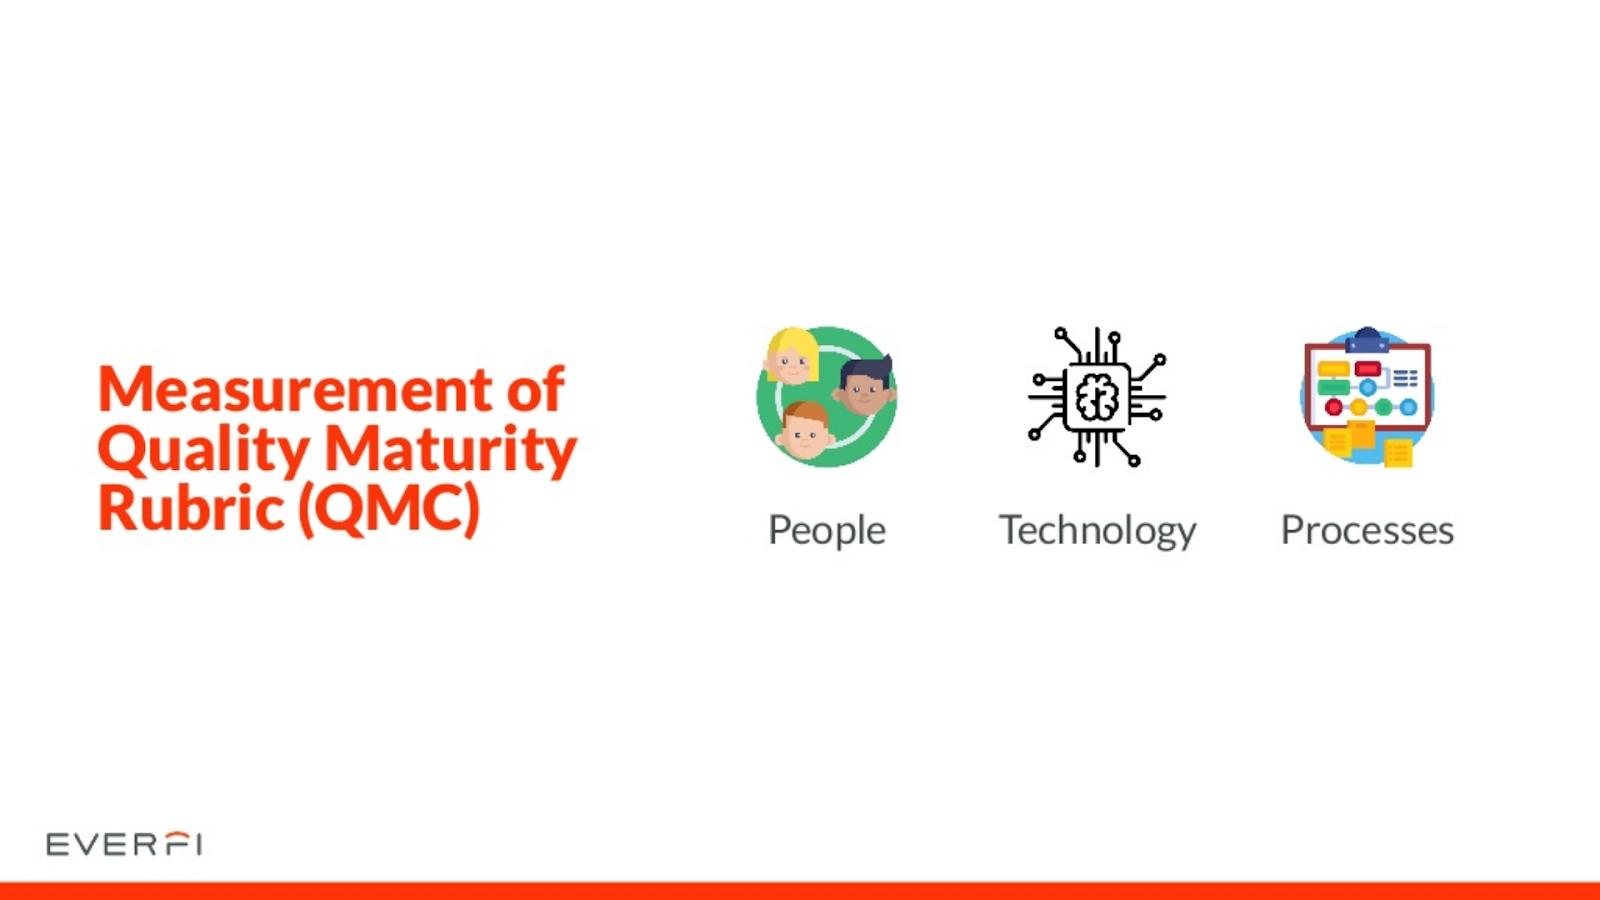 measurement of quality maturity